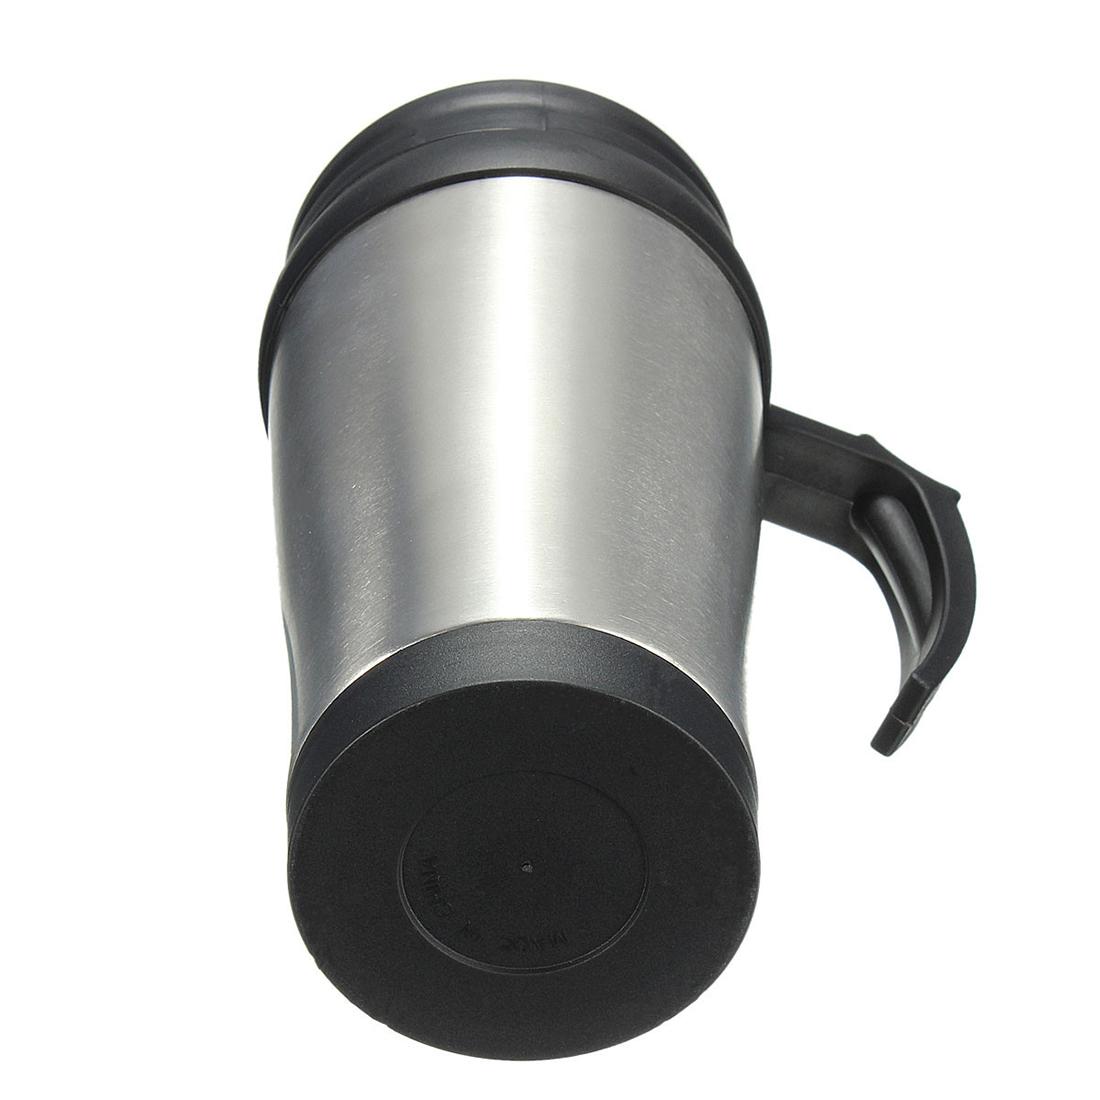 stainless steel car mug travel tumbler water coffee tea. Black Bedroom Furniture Sets. Home Design Ideas